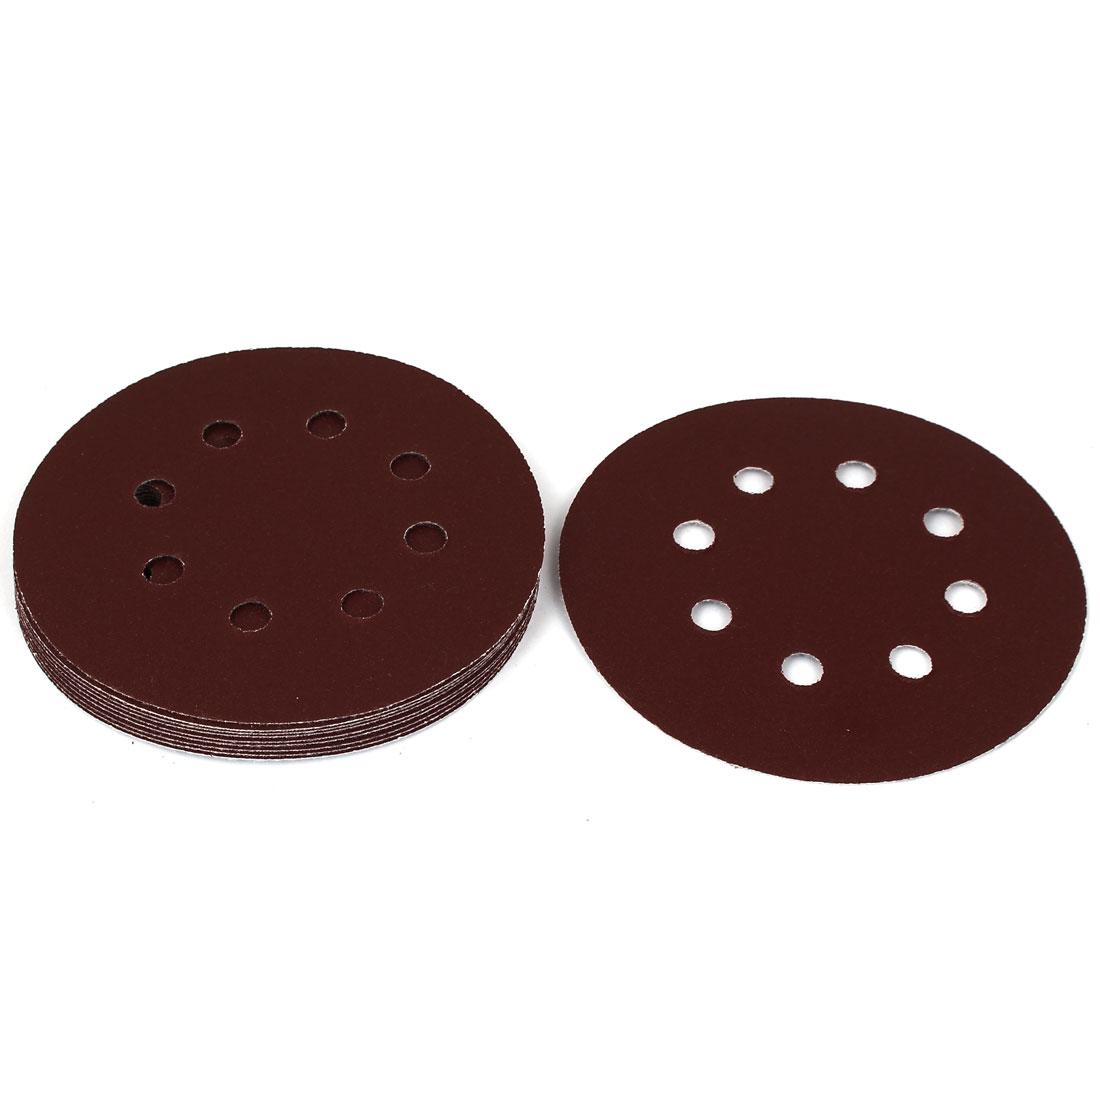 "5"" Dia 180 Grit 8 Holes Sanding Disc Sandpaper 10pcs for Oscillating Tool"